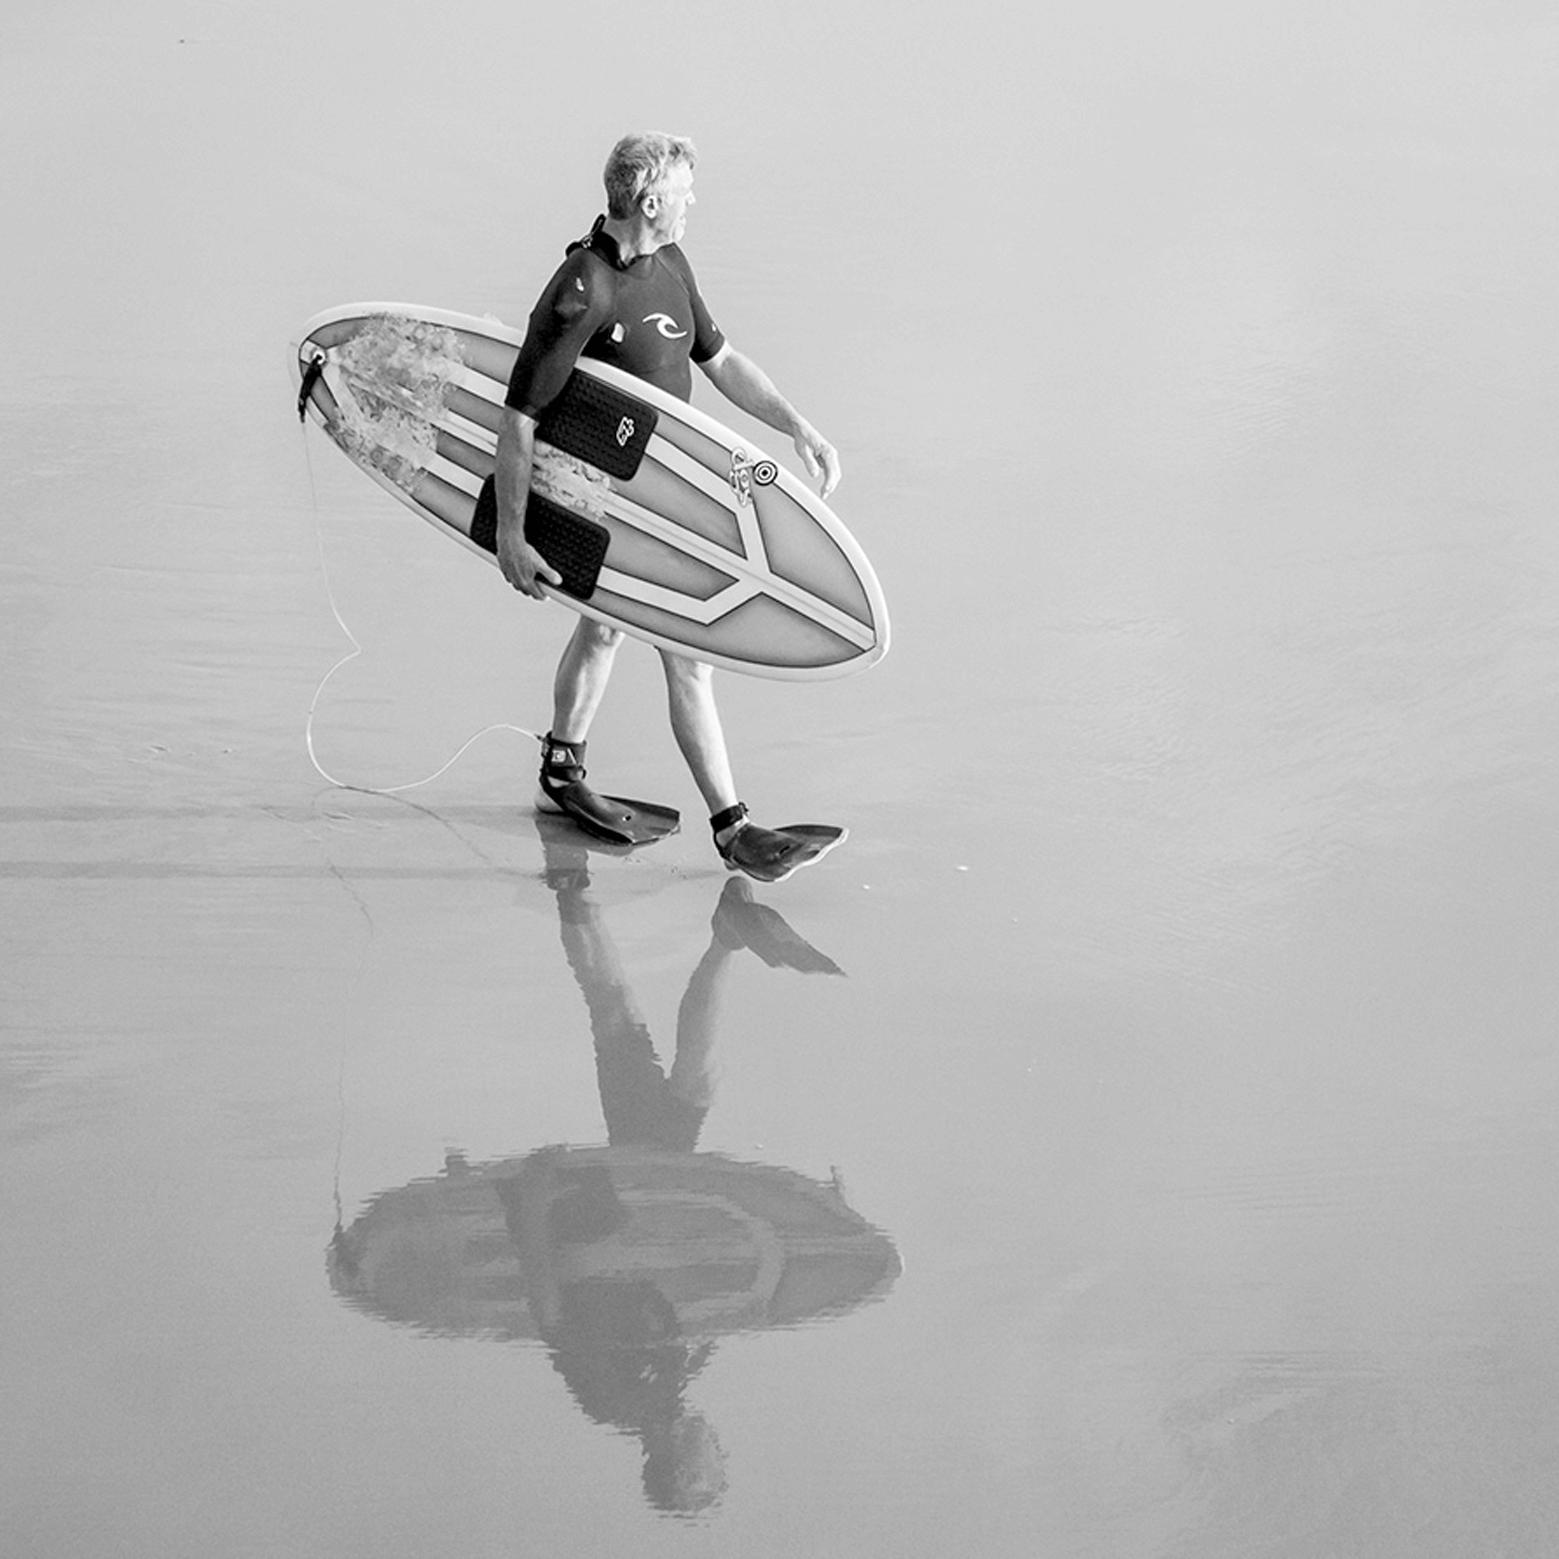 man walking on the beach, reflection on water, surfer, beach, walking, surfing, durban, sport photography.